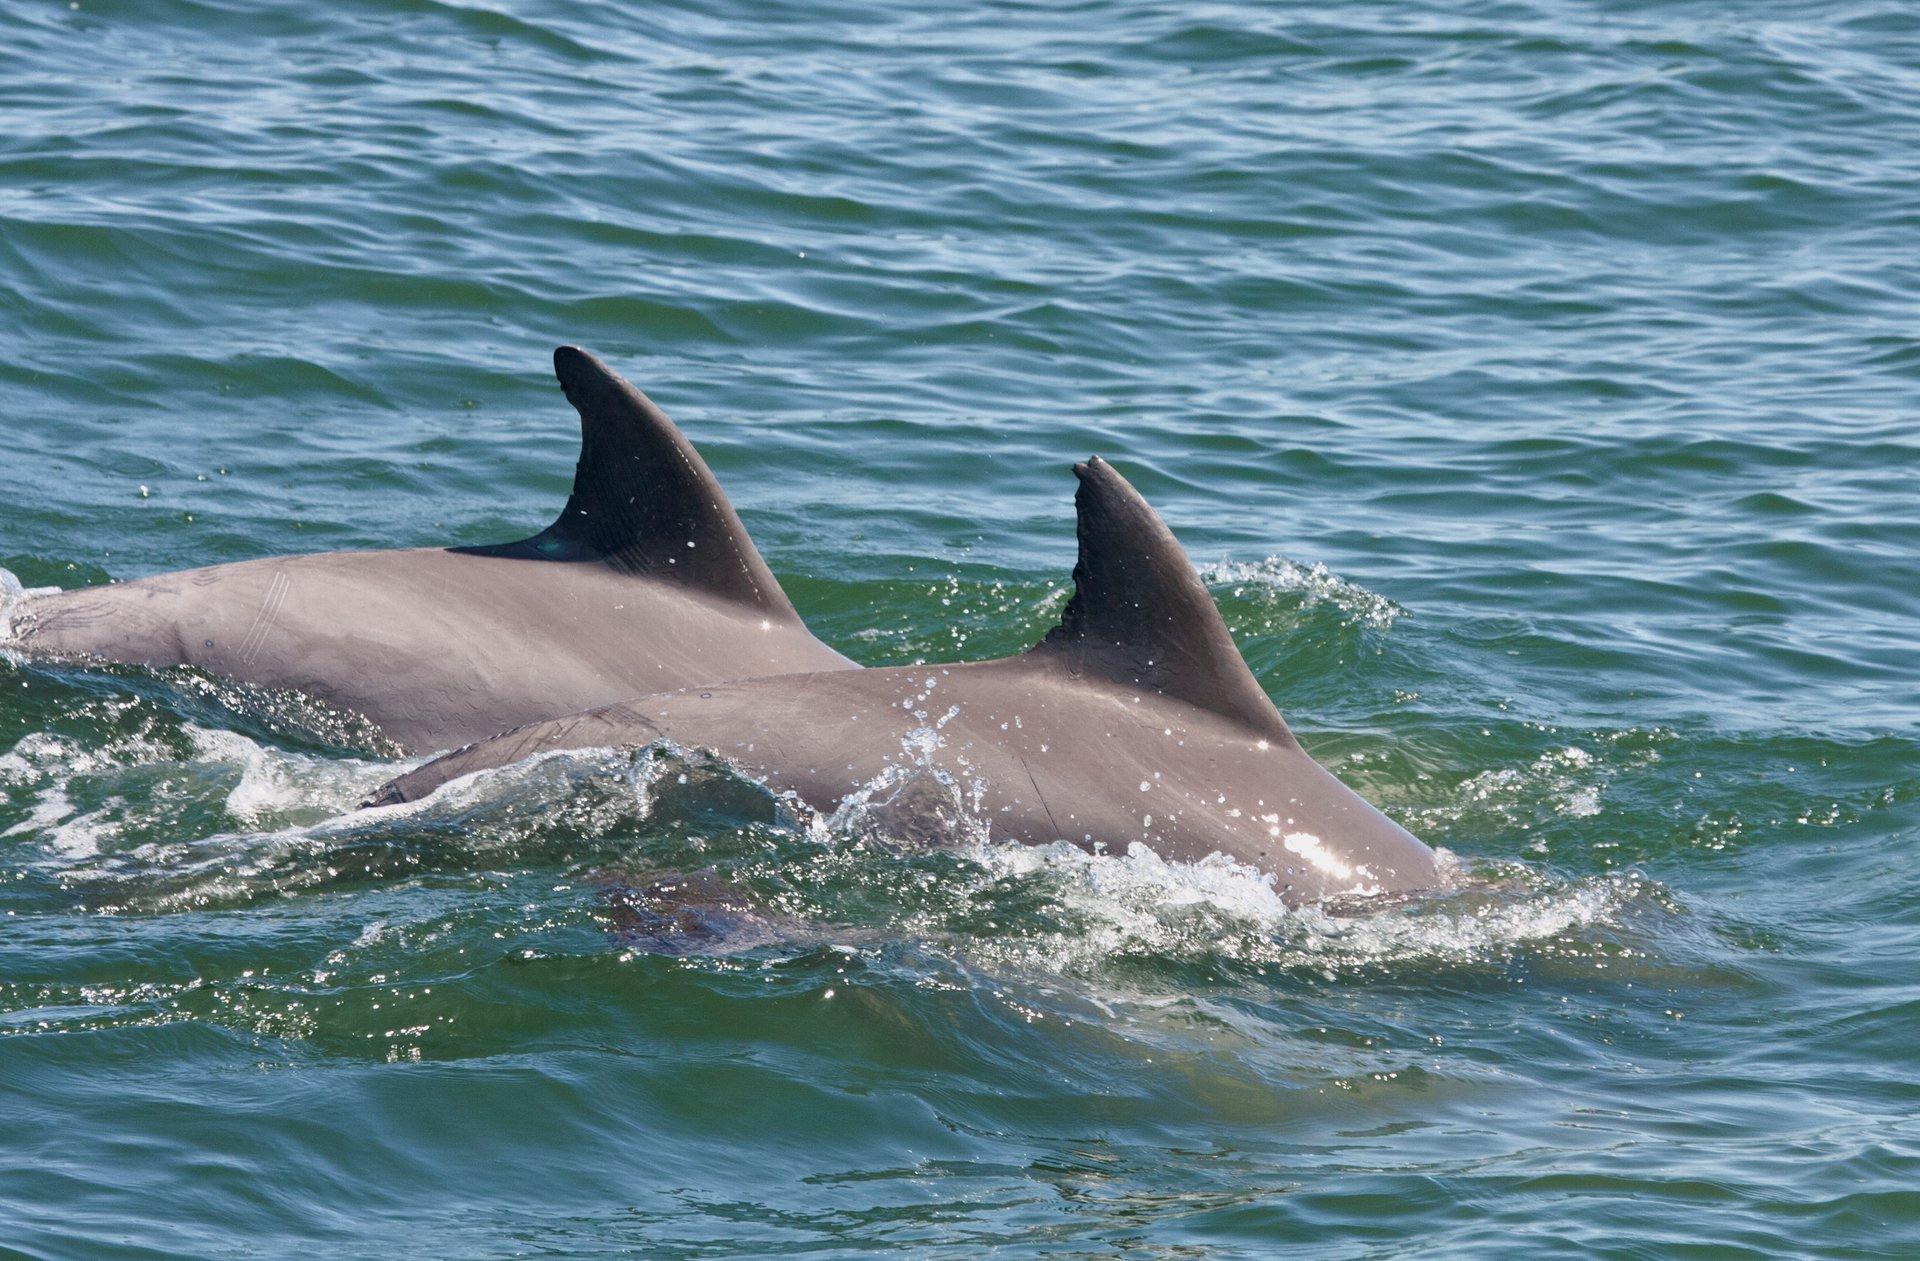 Dolphin Watching in Virginia Beach in Virginia 2020 - Best Time